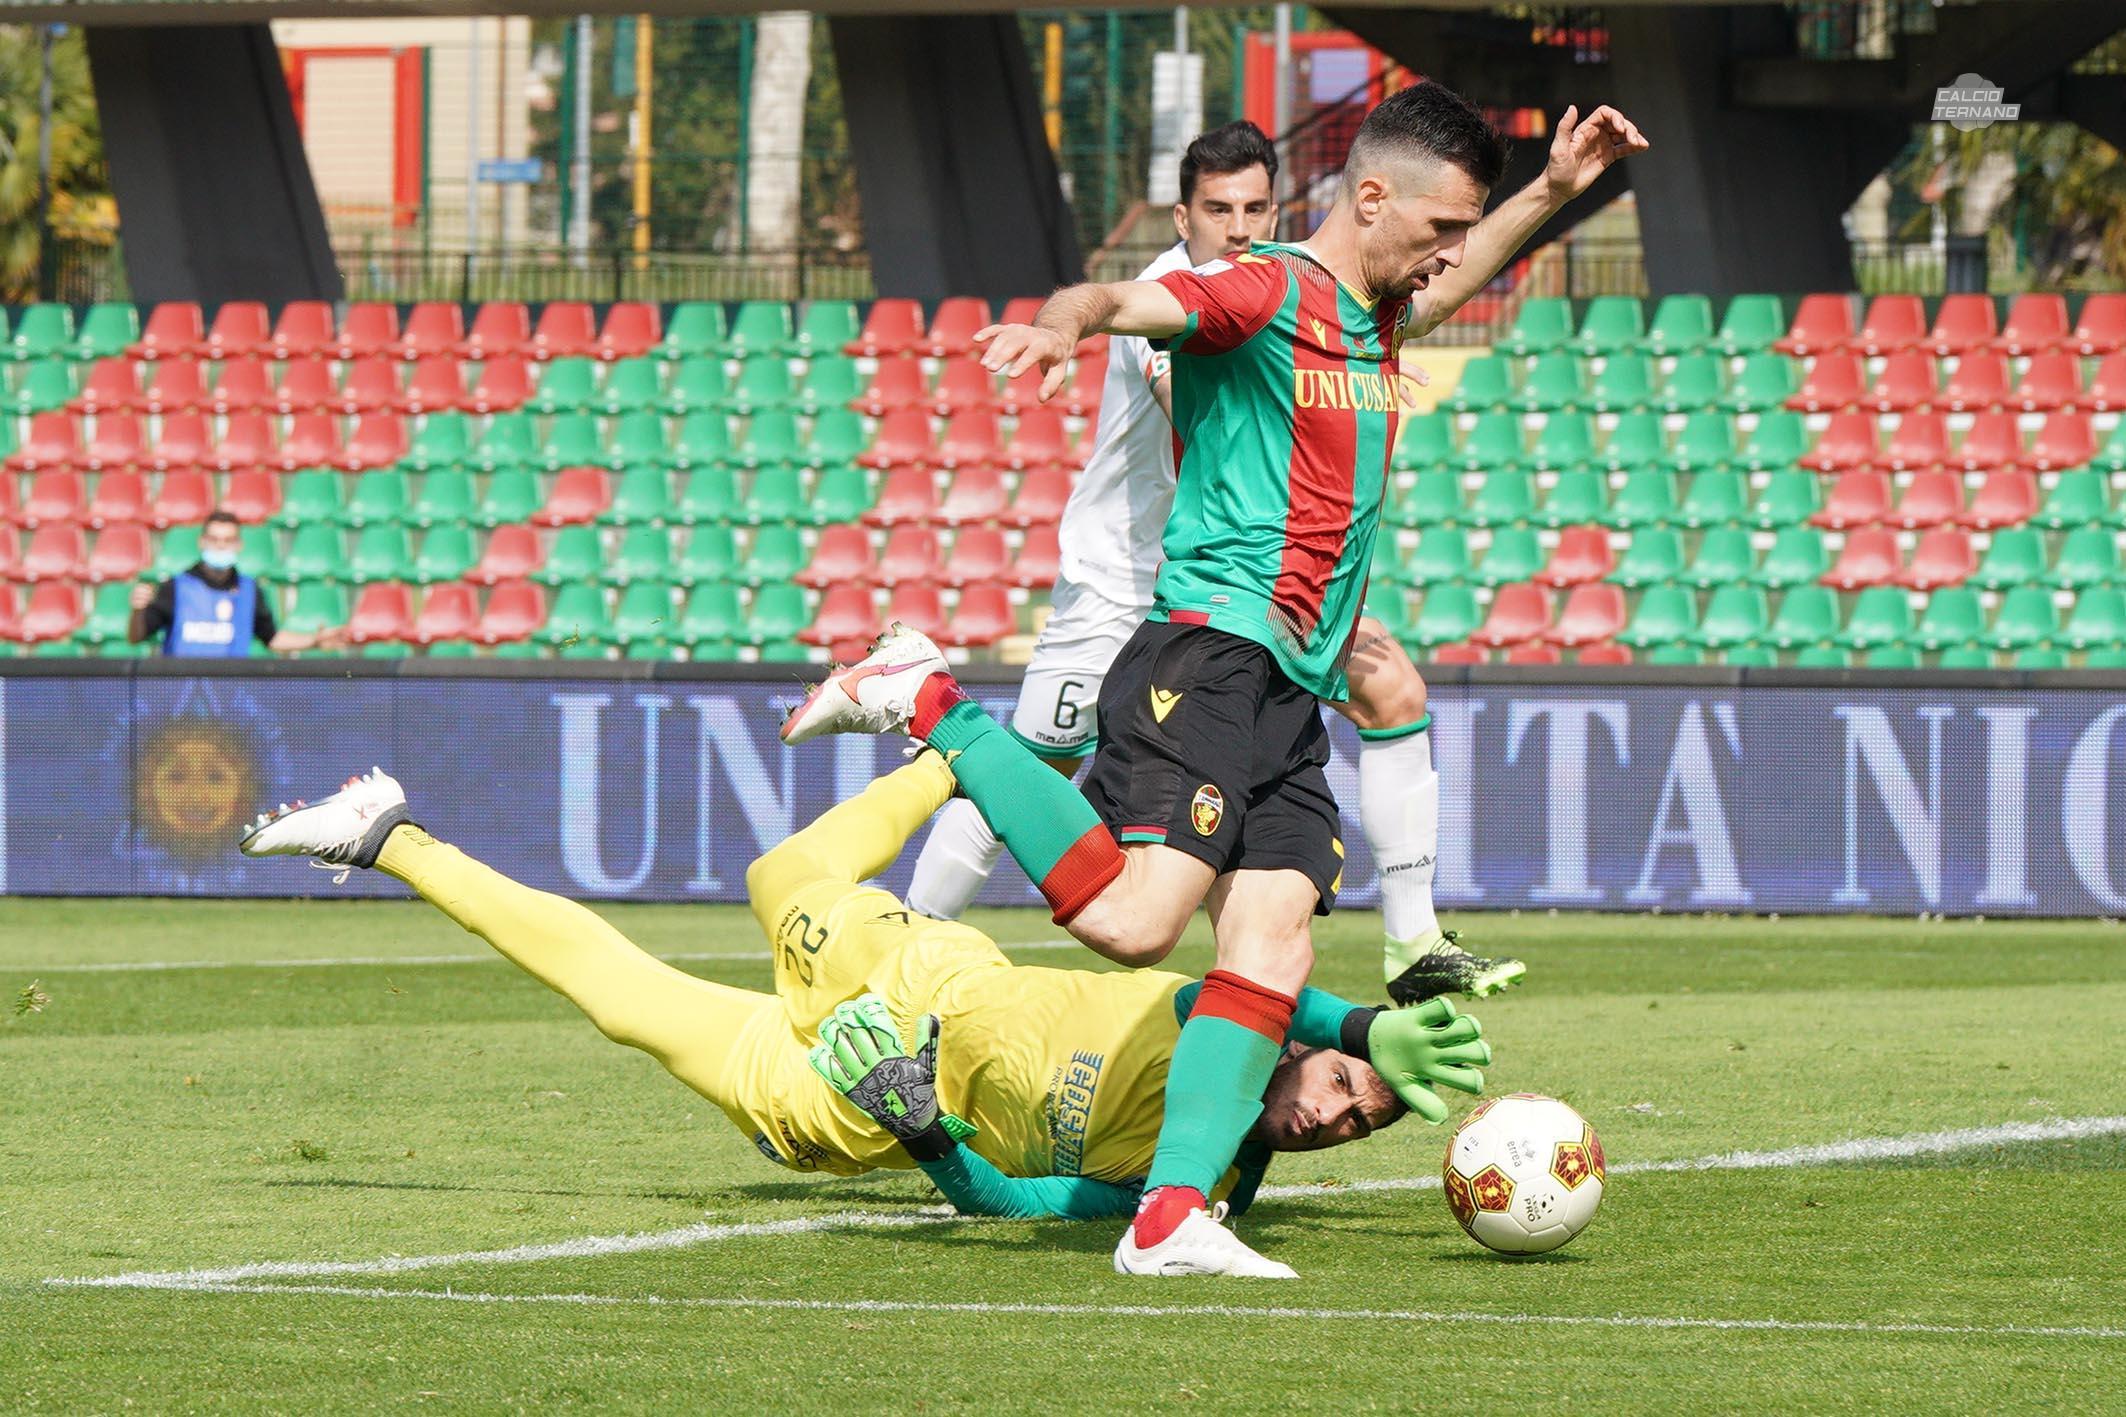 Ternana-Avellino furlan gol